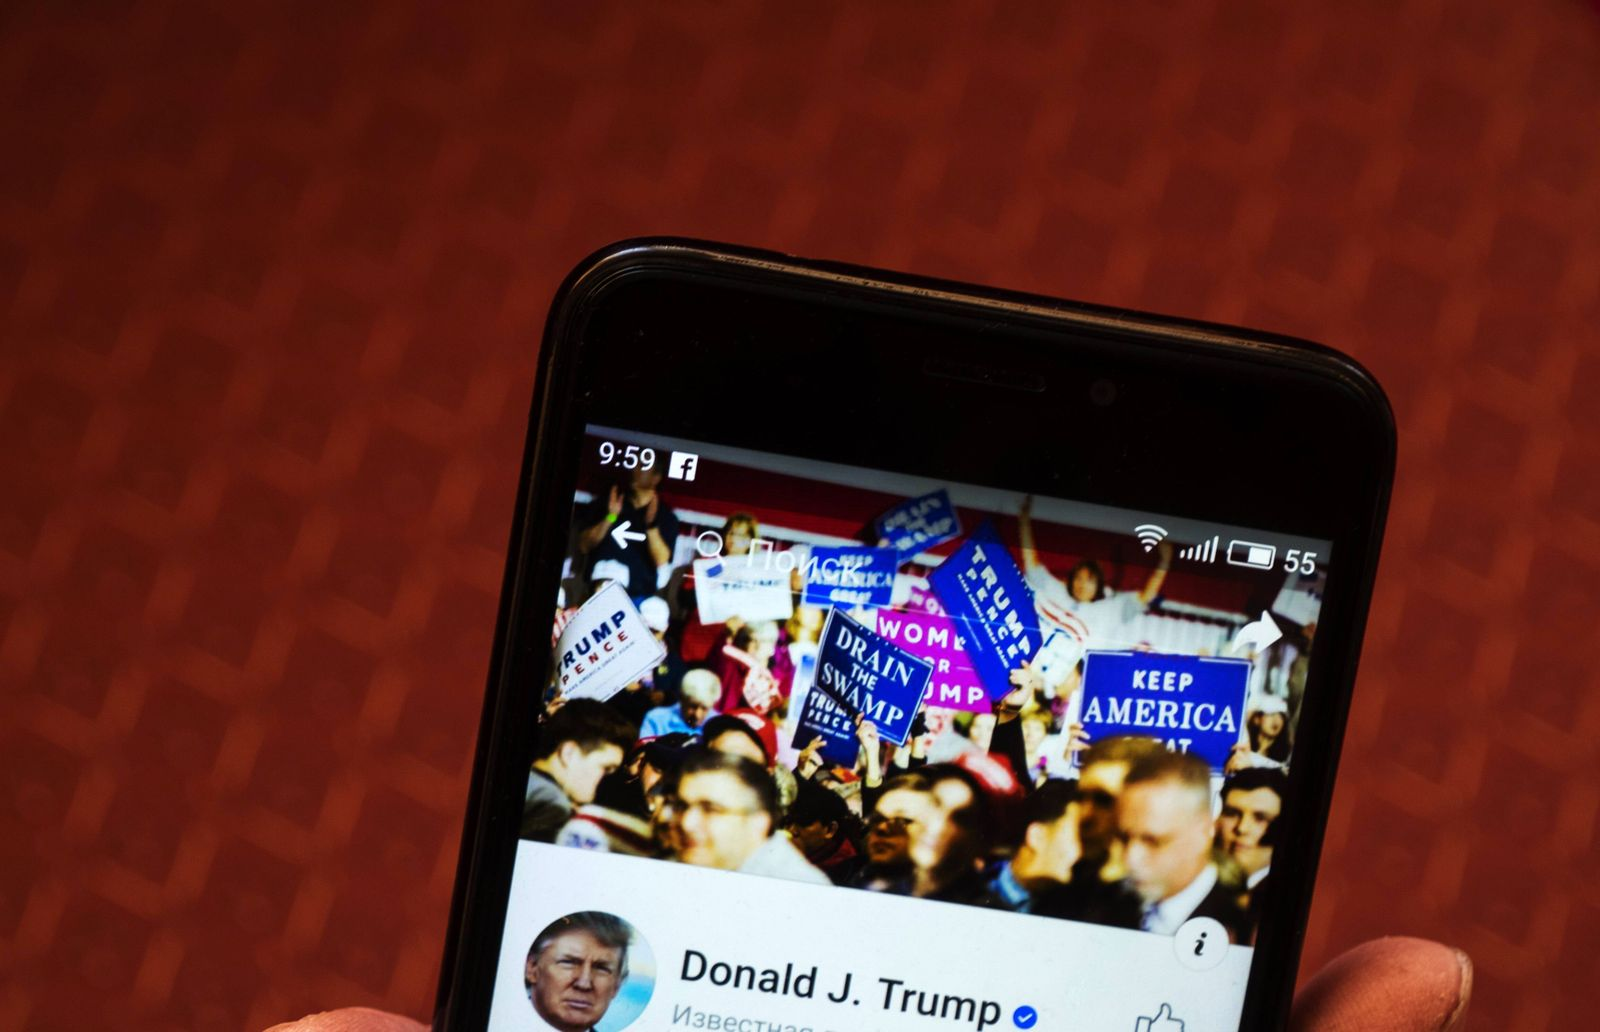 October 7 2018 Kiev Ukraine President of the United States of America Donald Trump Facebook ac